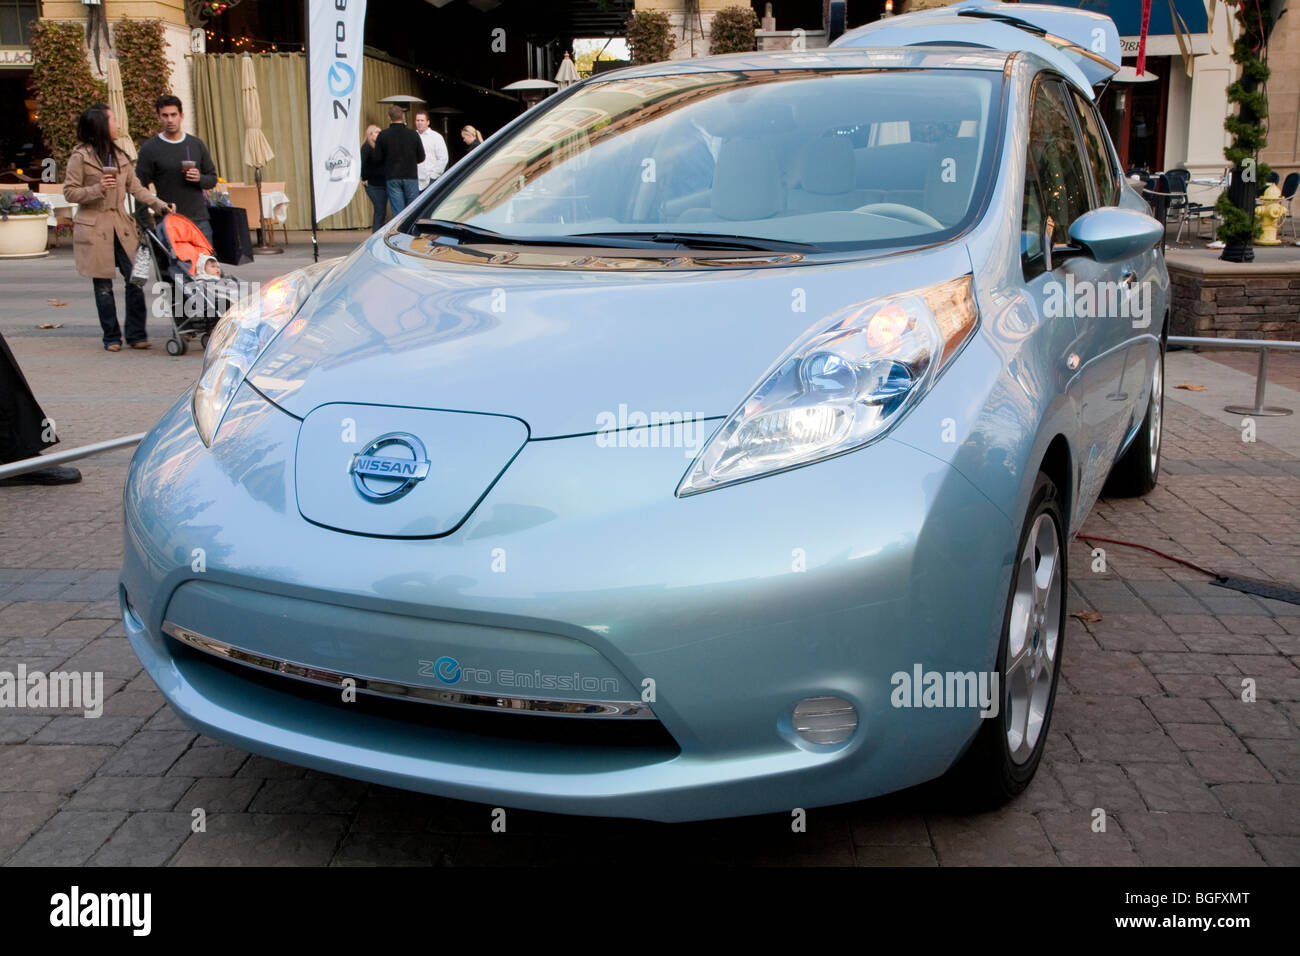 Nissan San Jose >> Angled Front View Of Nissan Leaf Electric Car Nissan Leaf